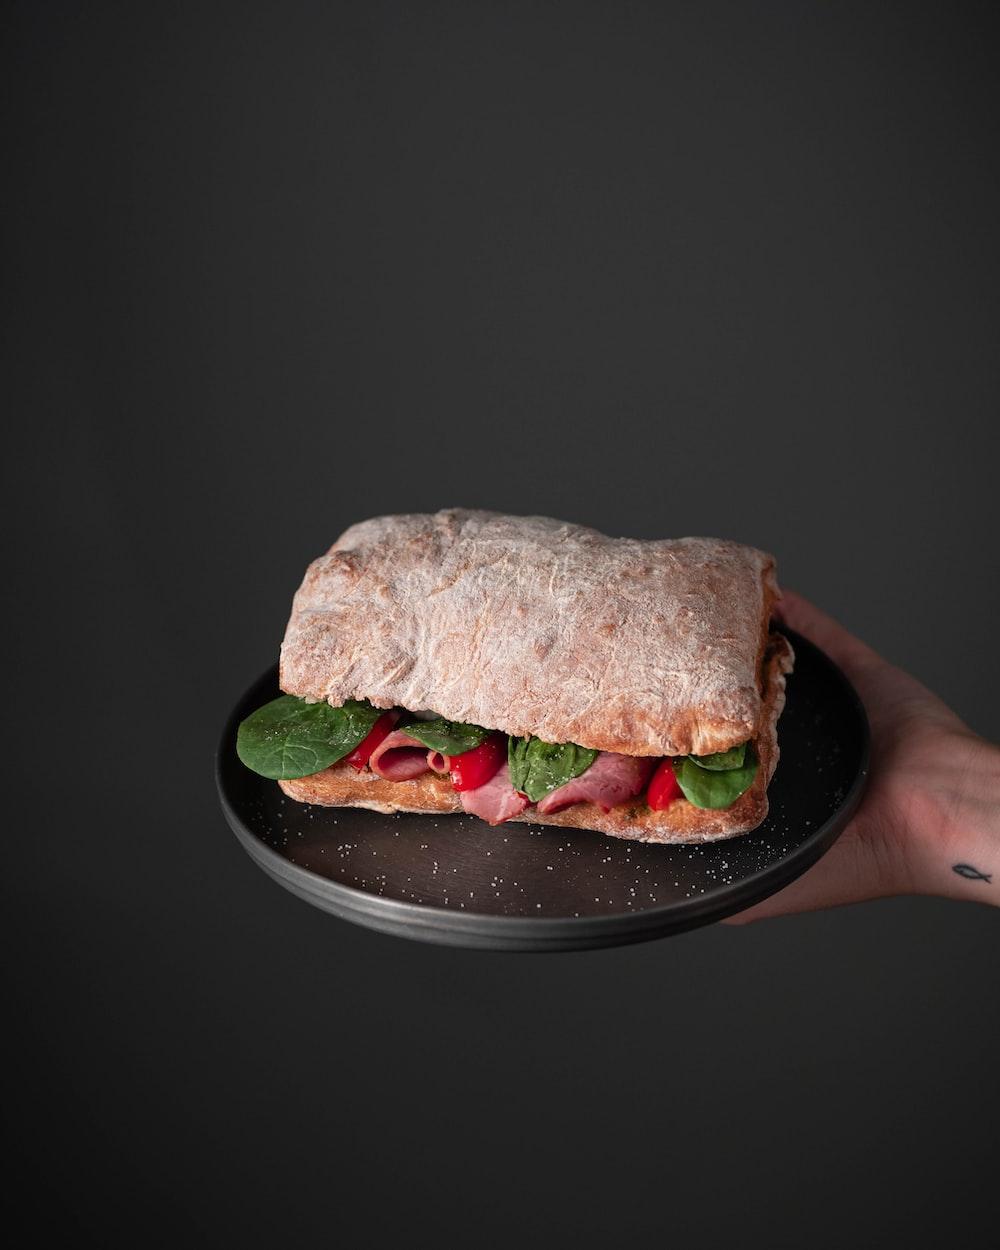 burger on black ceramic plate